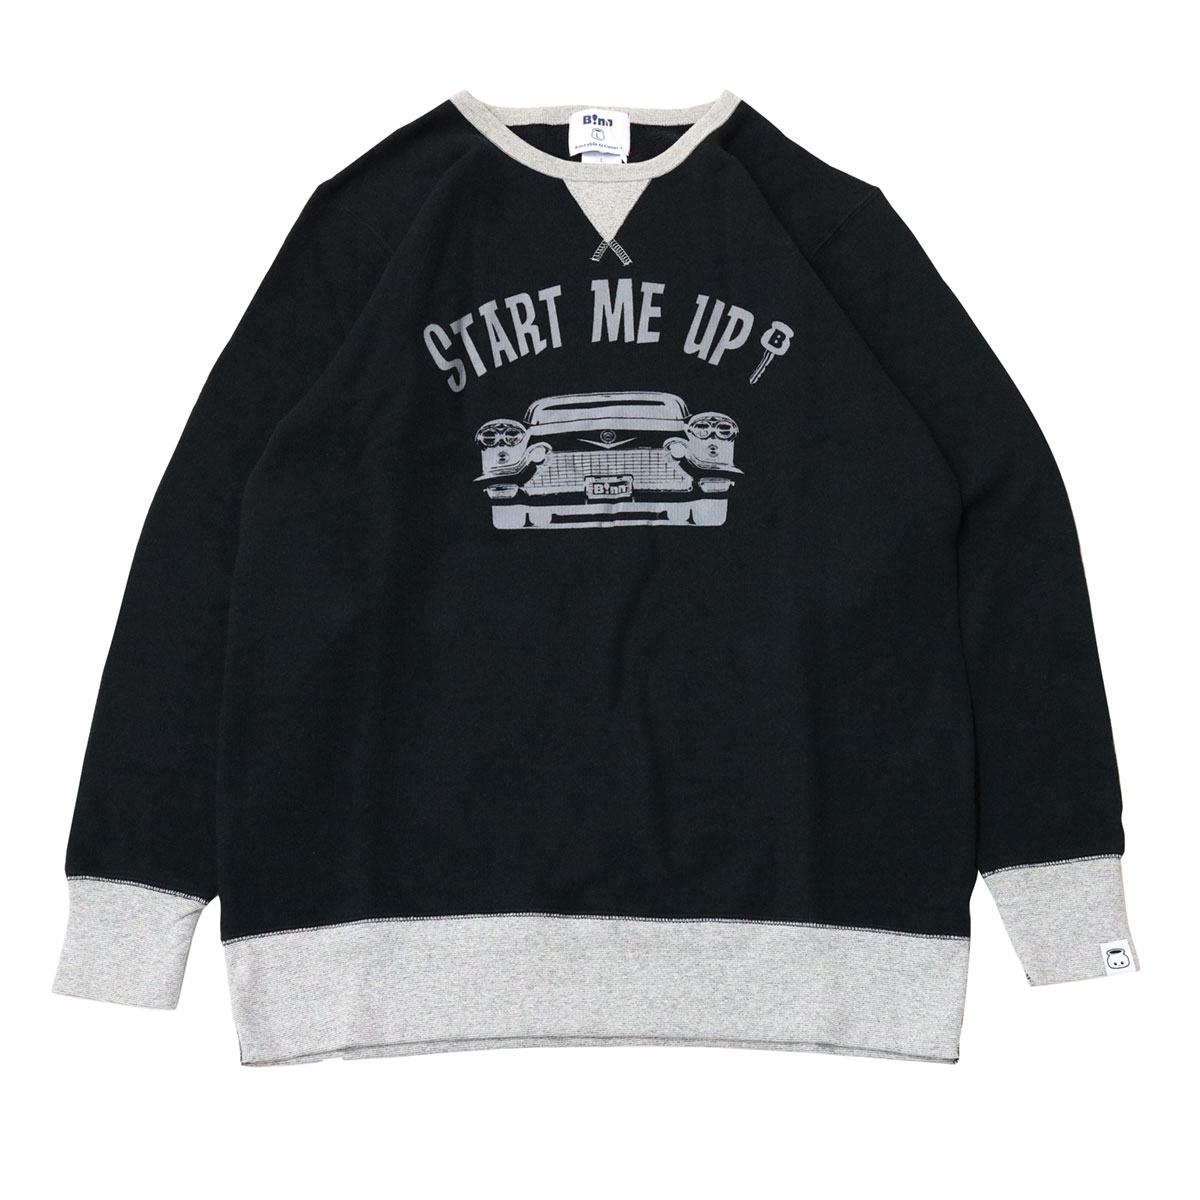 START ME UP! Crew Sweat (Black x Gray)